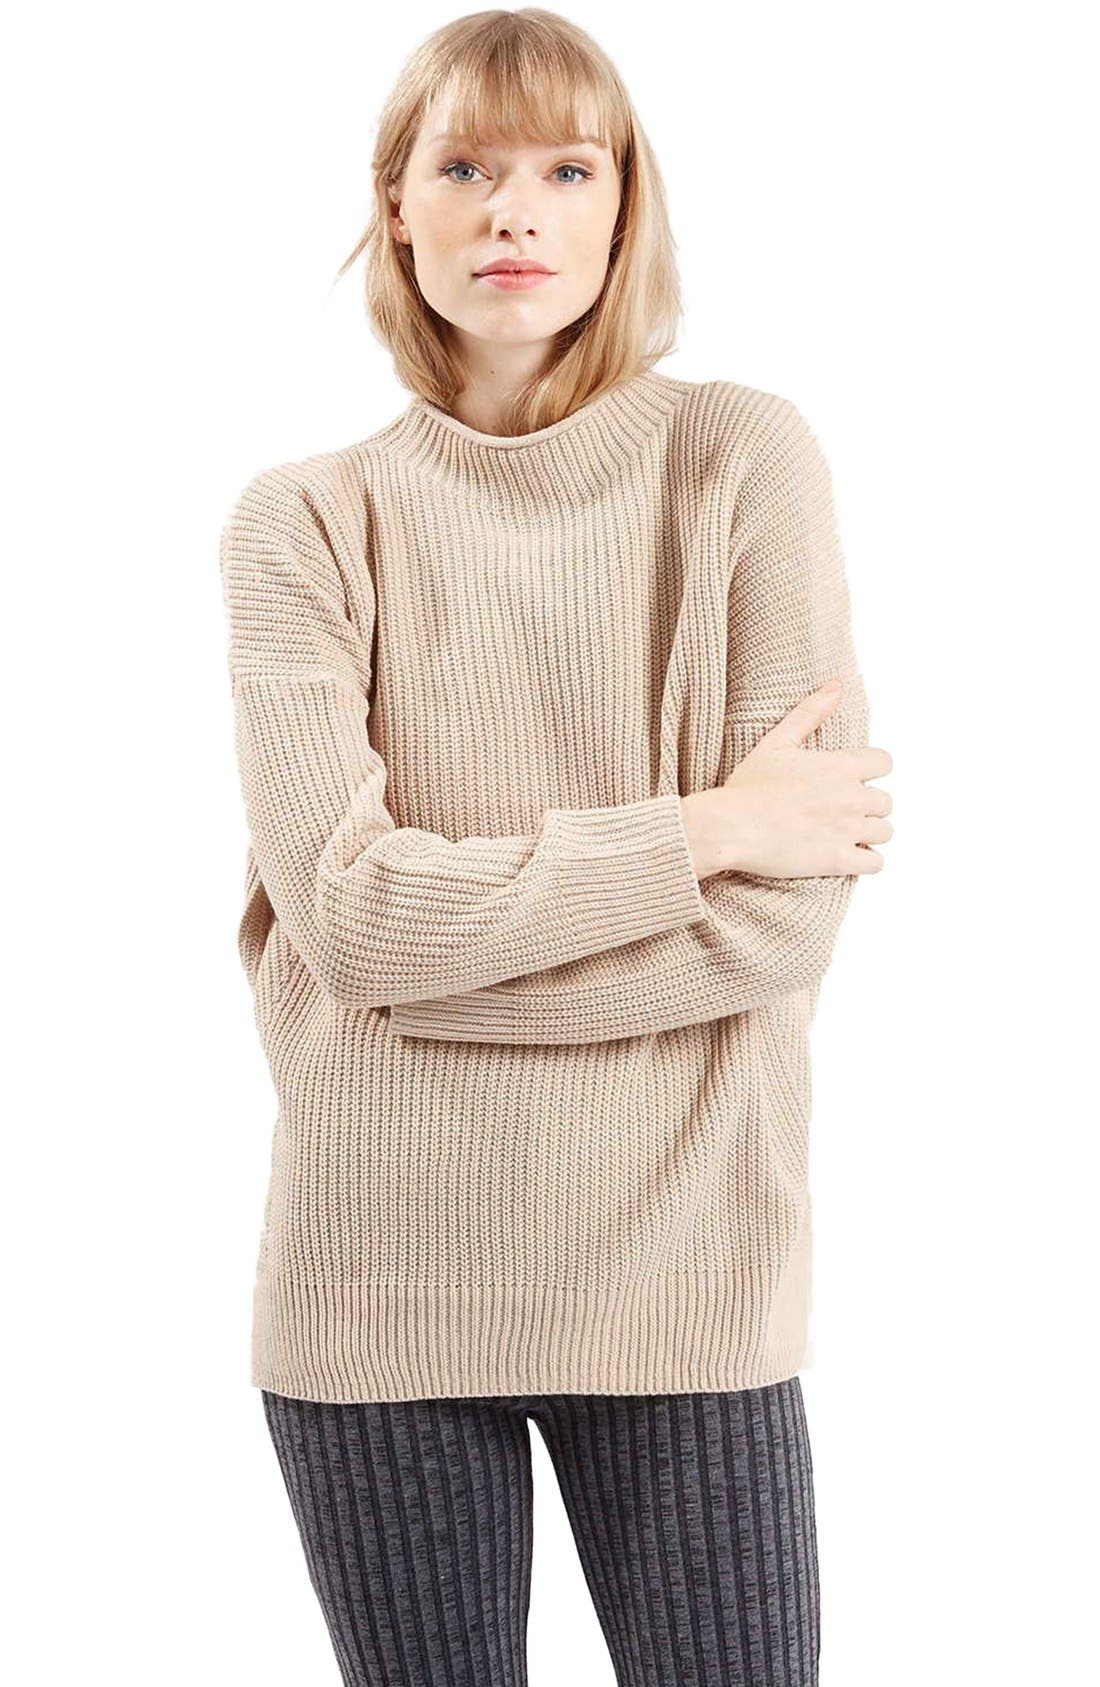 Alternate Image 1 Selected - TopshopFunnel NeckSide SlitSweater (Petite)